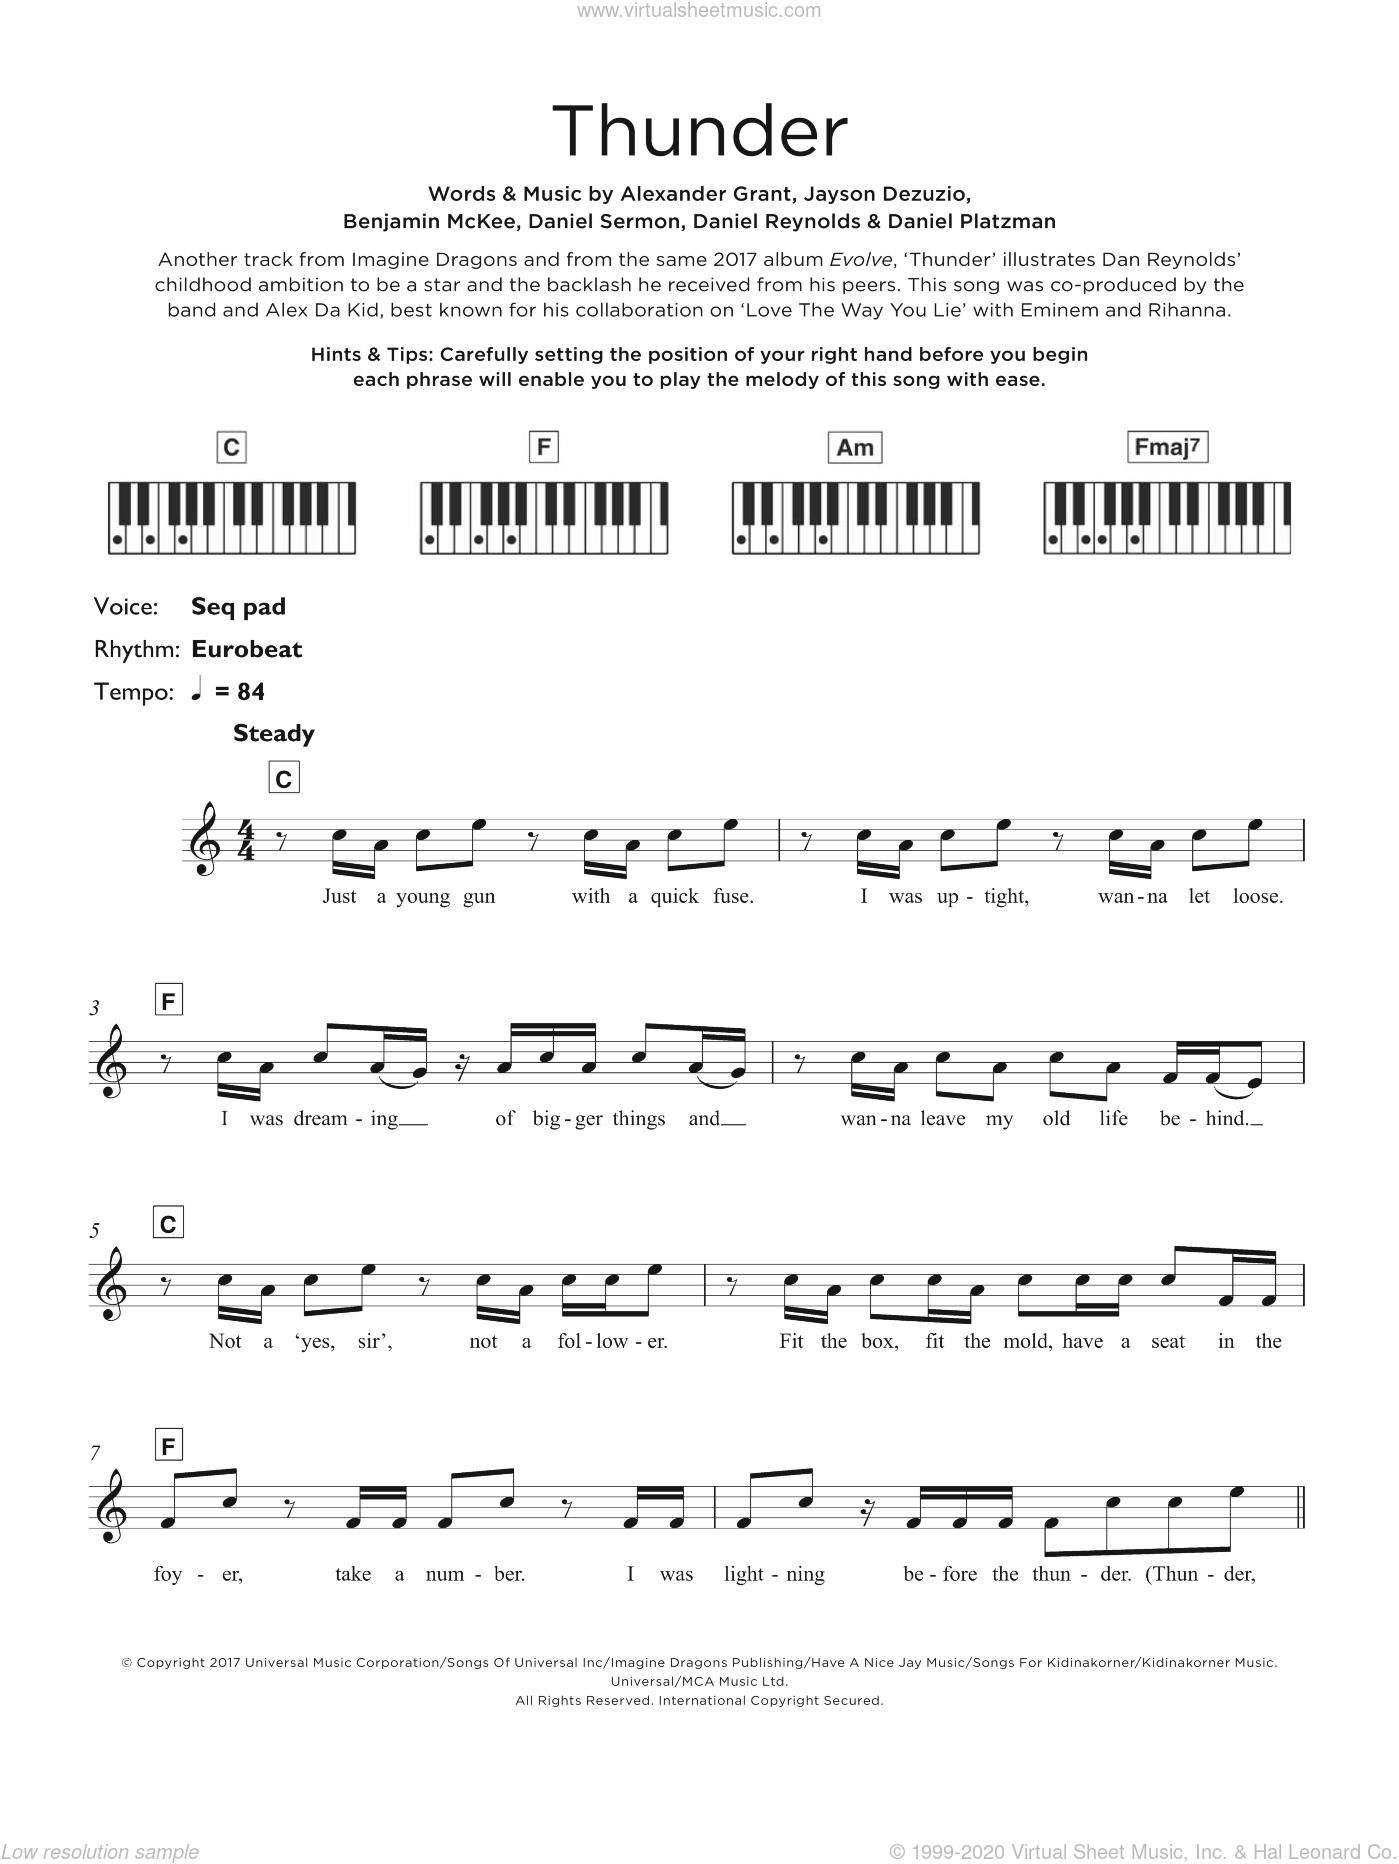 Thunder sheet music for piano solo (keyboard) by Imagine Dragons, Alexander Grant, Benjamin McKee, Daniel Platzman, Daniel Reynolds, Daniel Sermon and Jayson Dezuzio, intermediate piano (keyboard)